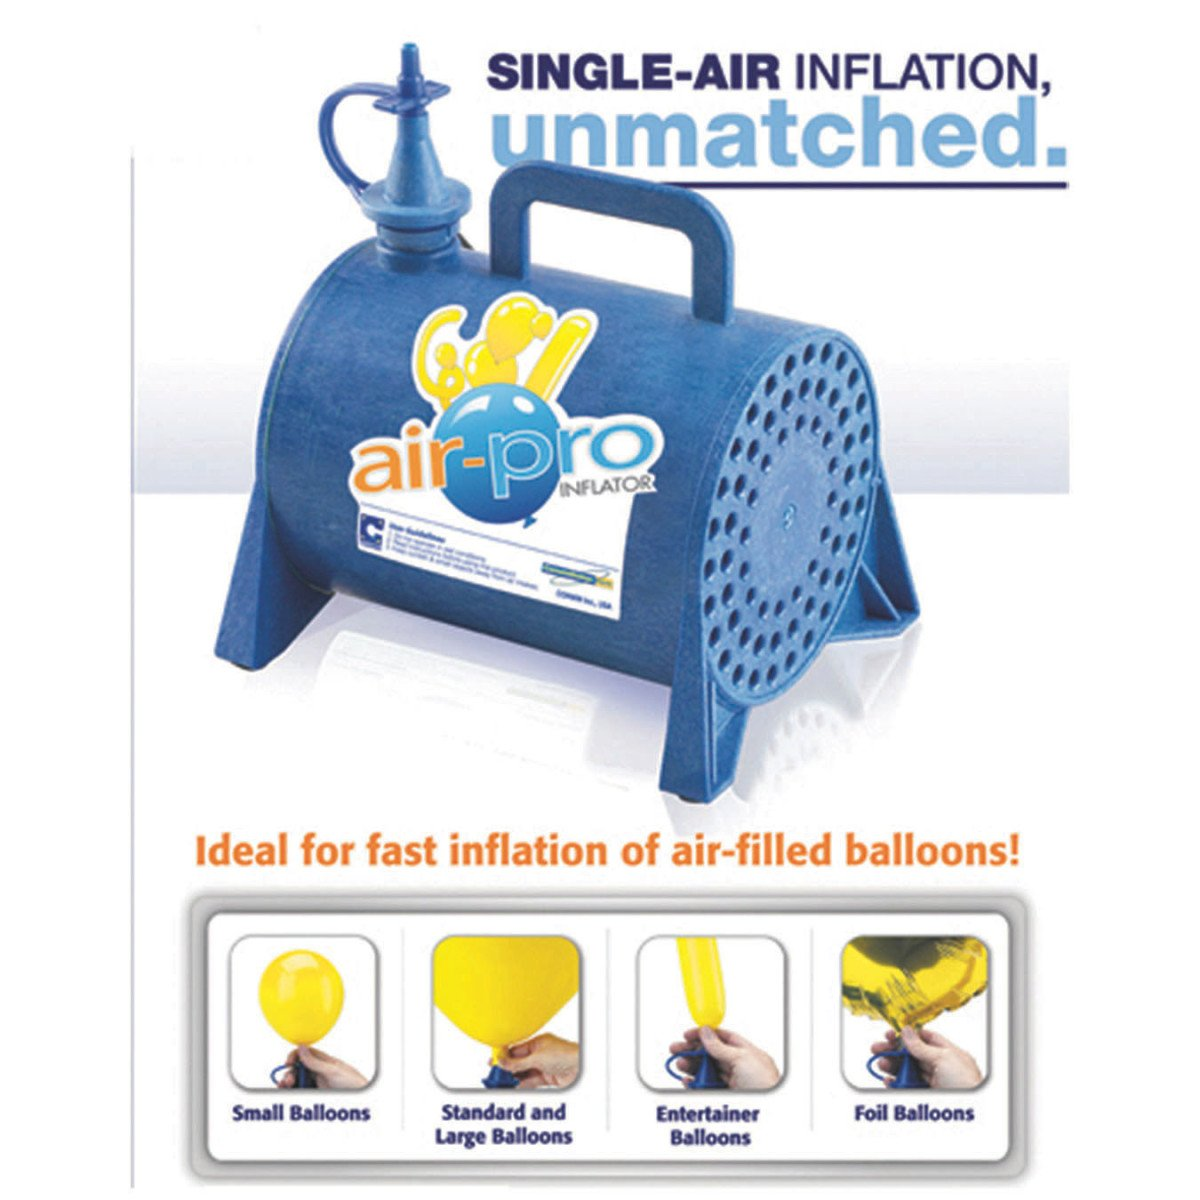 Air Pro Electric Air Balloon Inflator